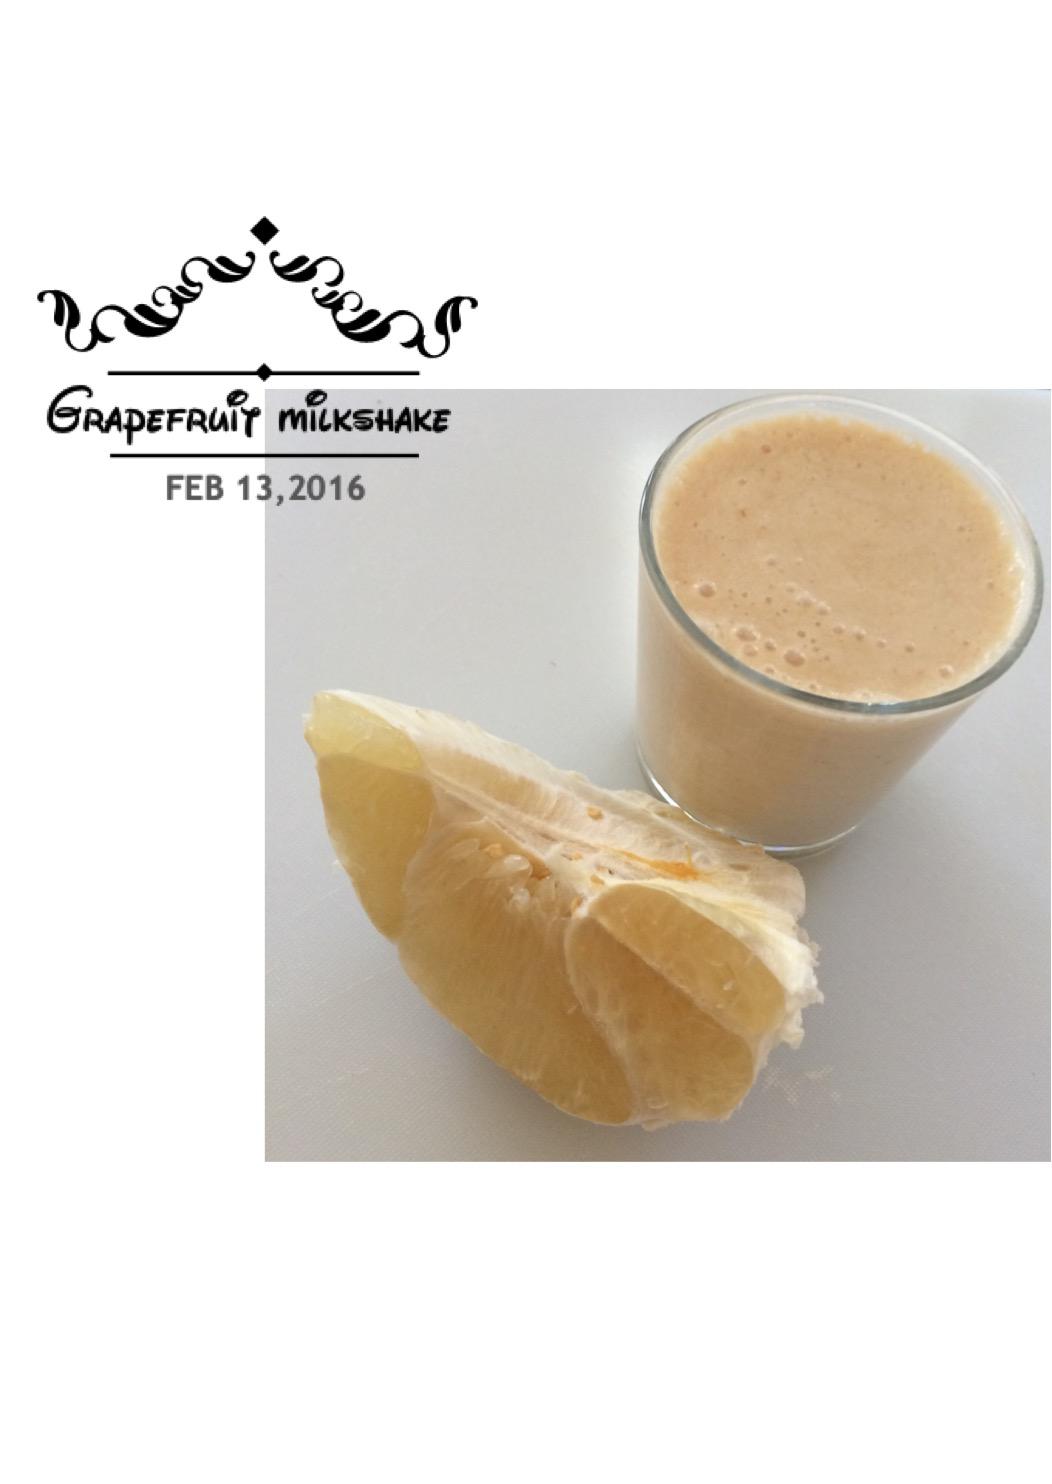 Grapefruit healthy milkshake